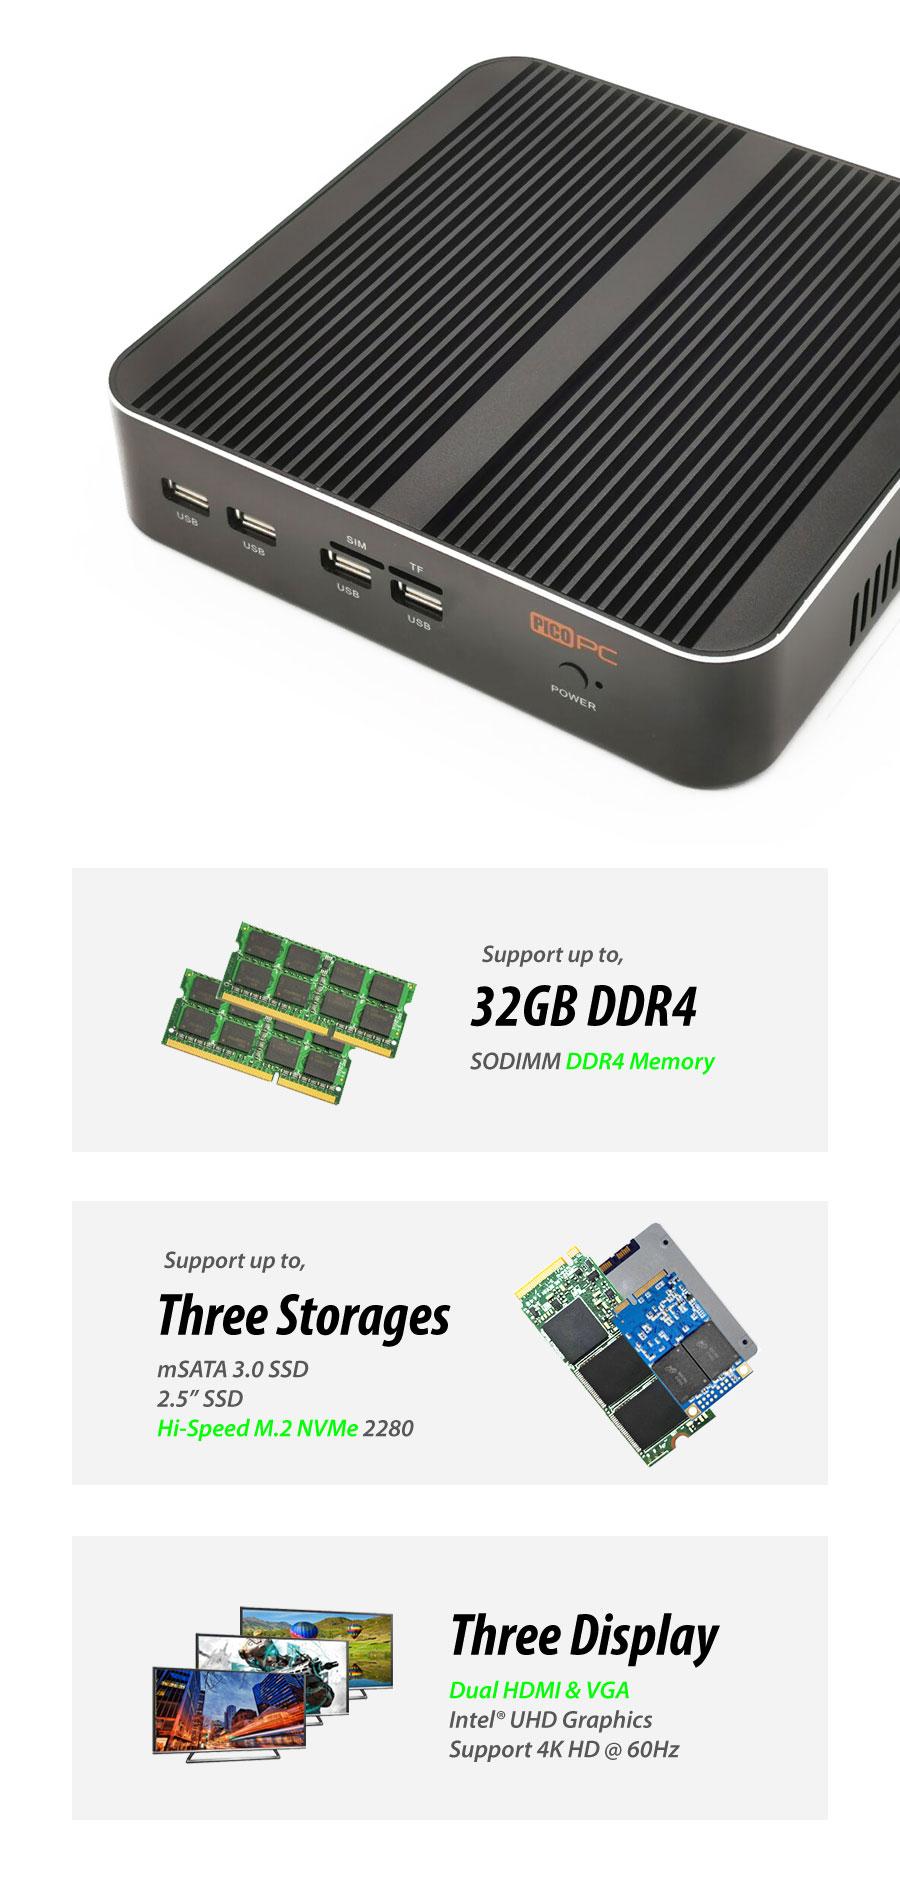 10th Gen. Intel® i7-10510U 2 LAN 3 Display Fanless Mini PC - MNHO-079 | Image